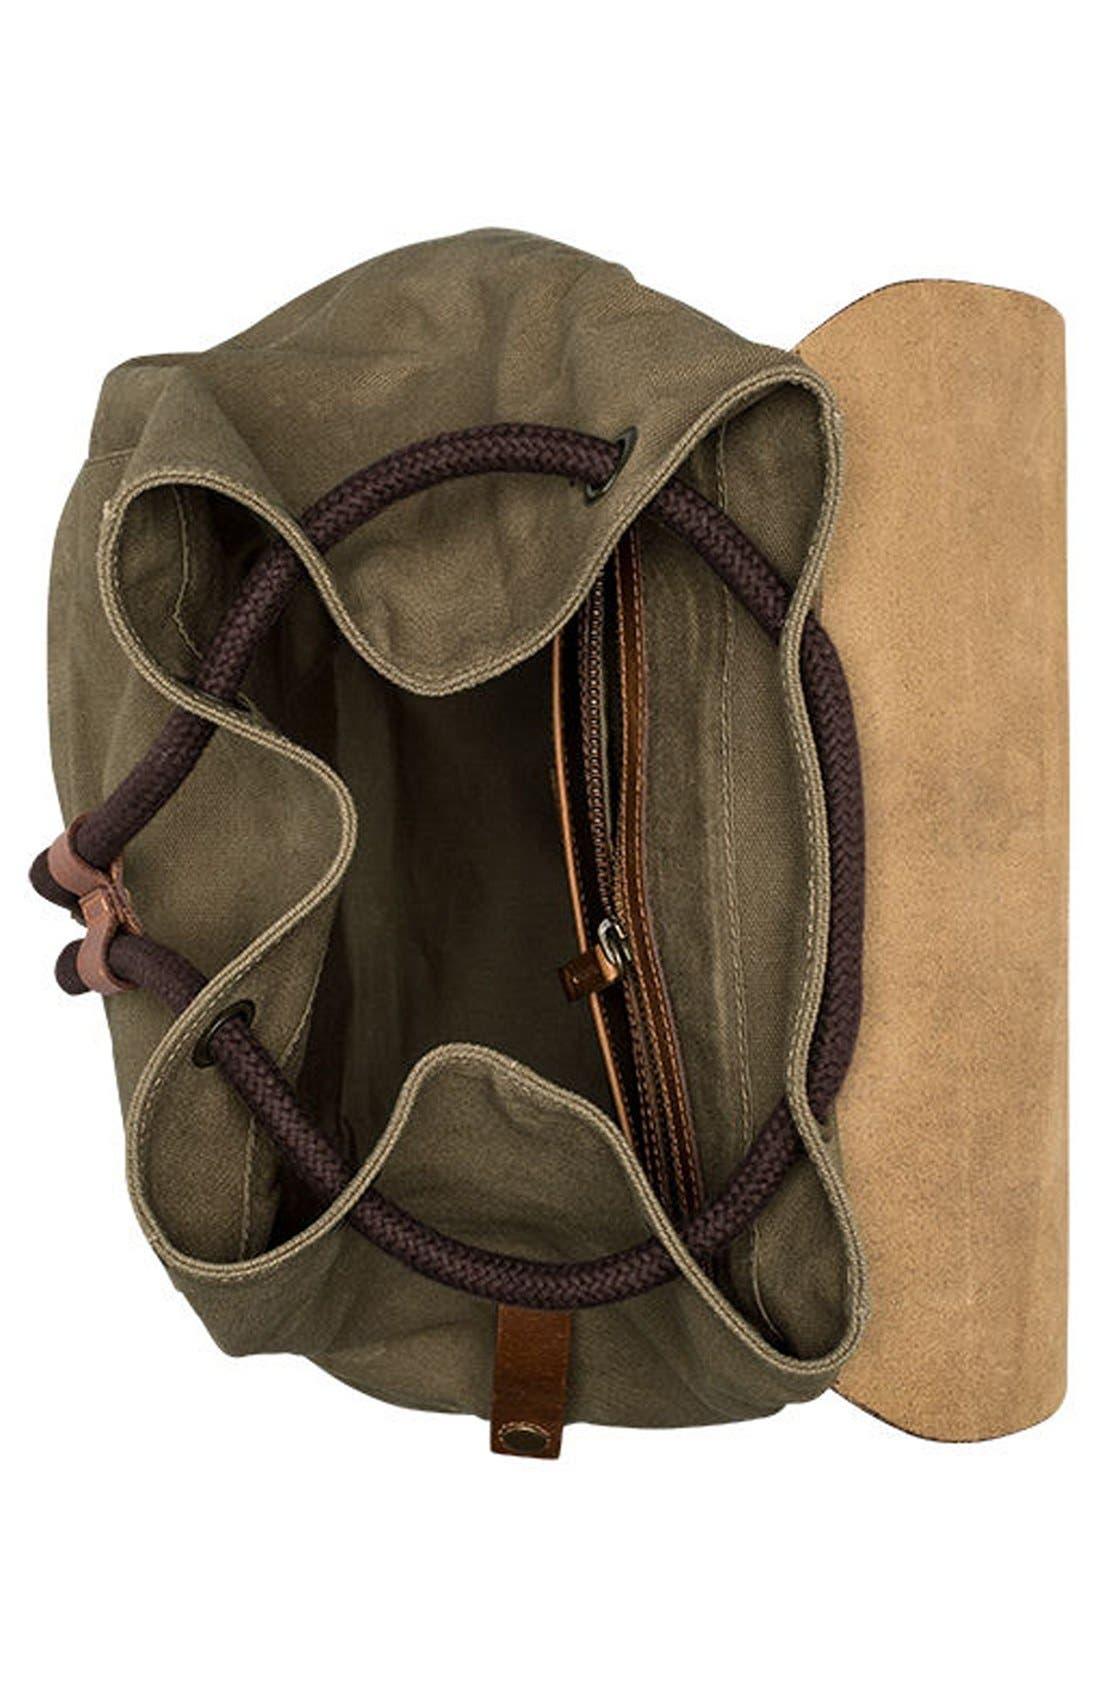 Nantasket Backpack,                             Alternate thumbnail 5, color,                             200